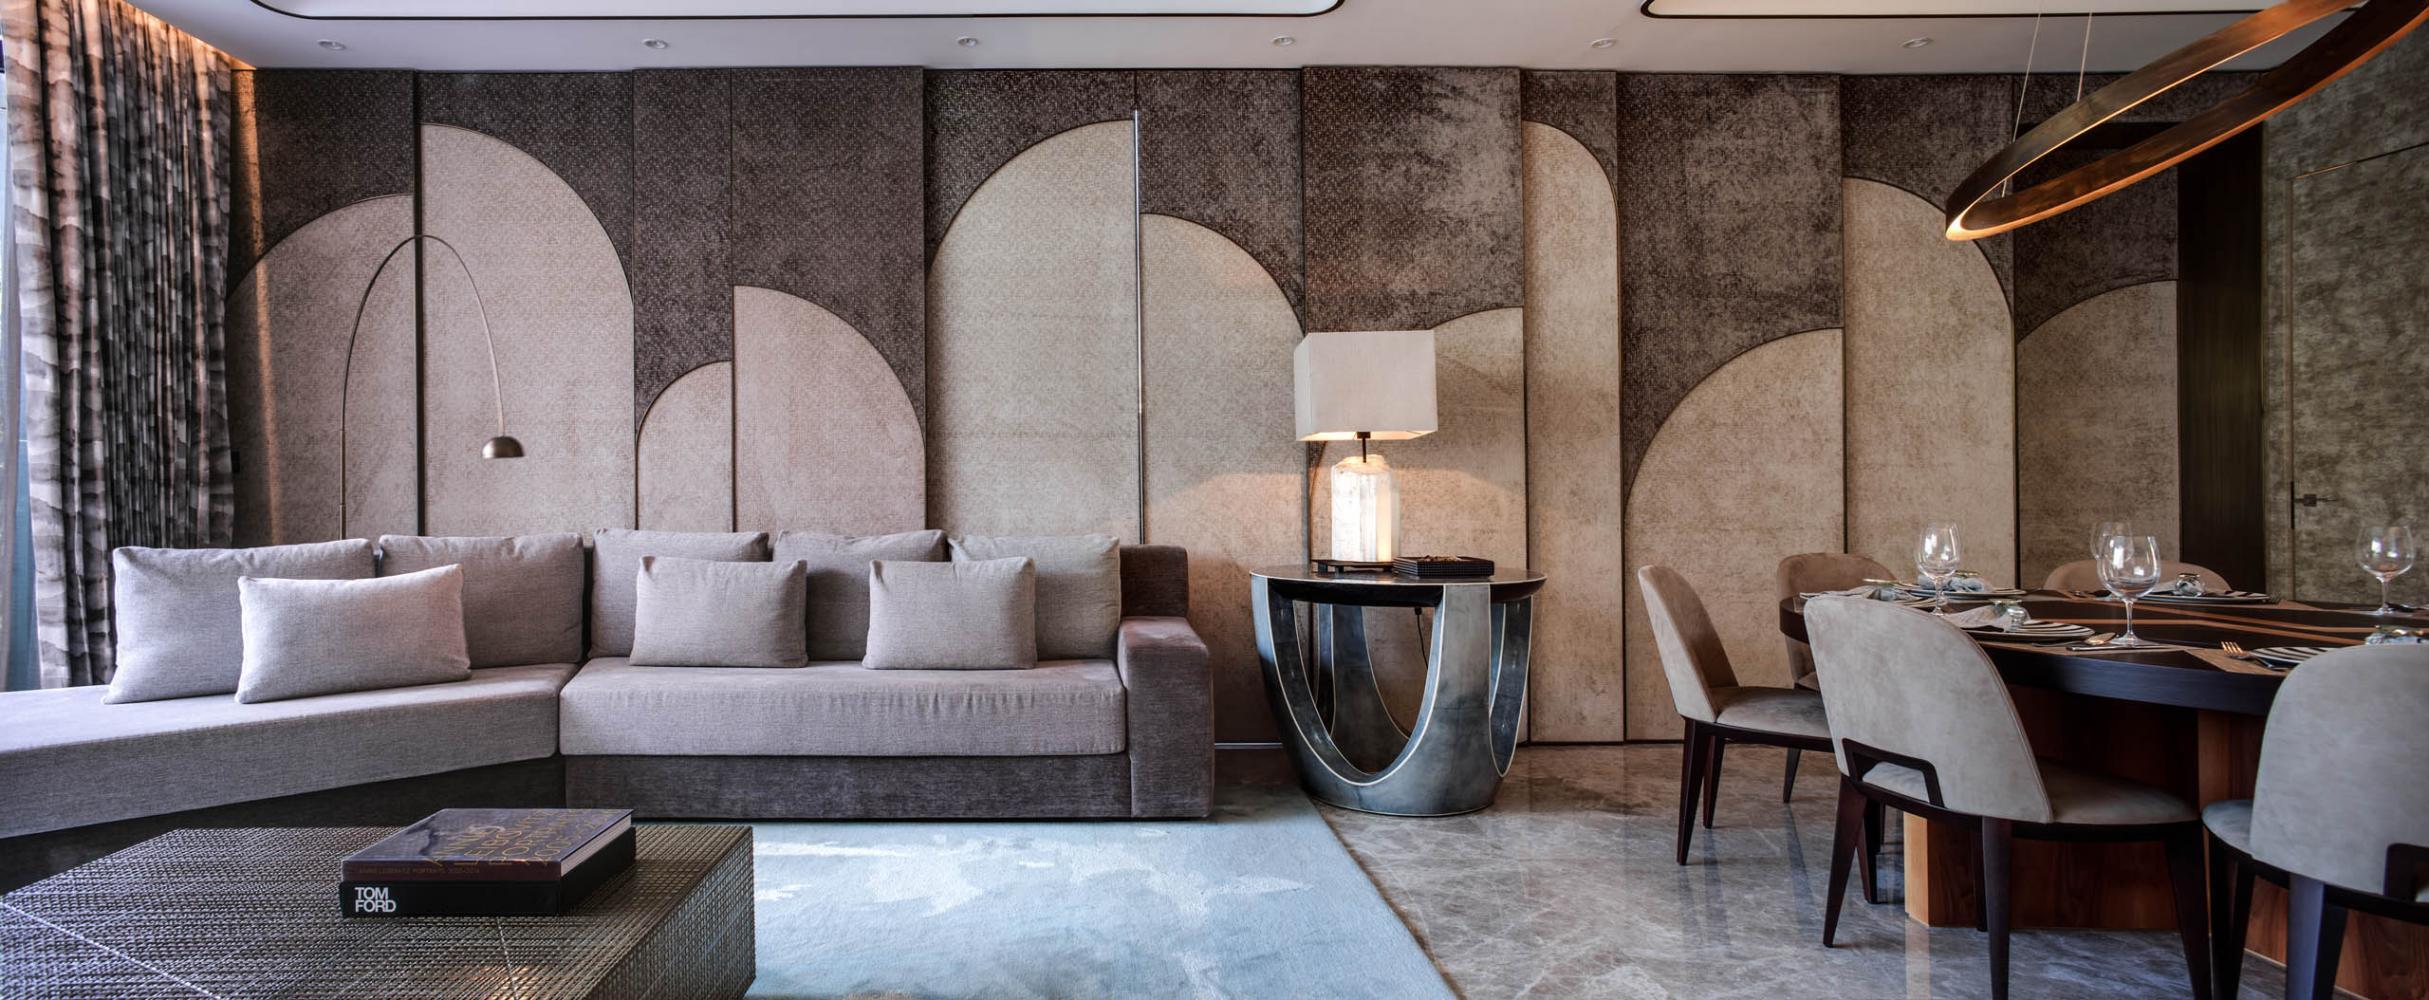 Laurameroni luxury apartment Stanley Hong Kong modern livingroom design